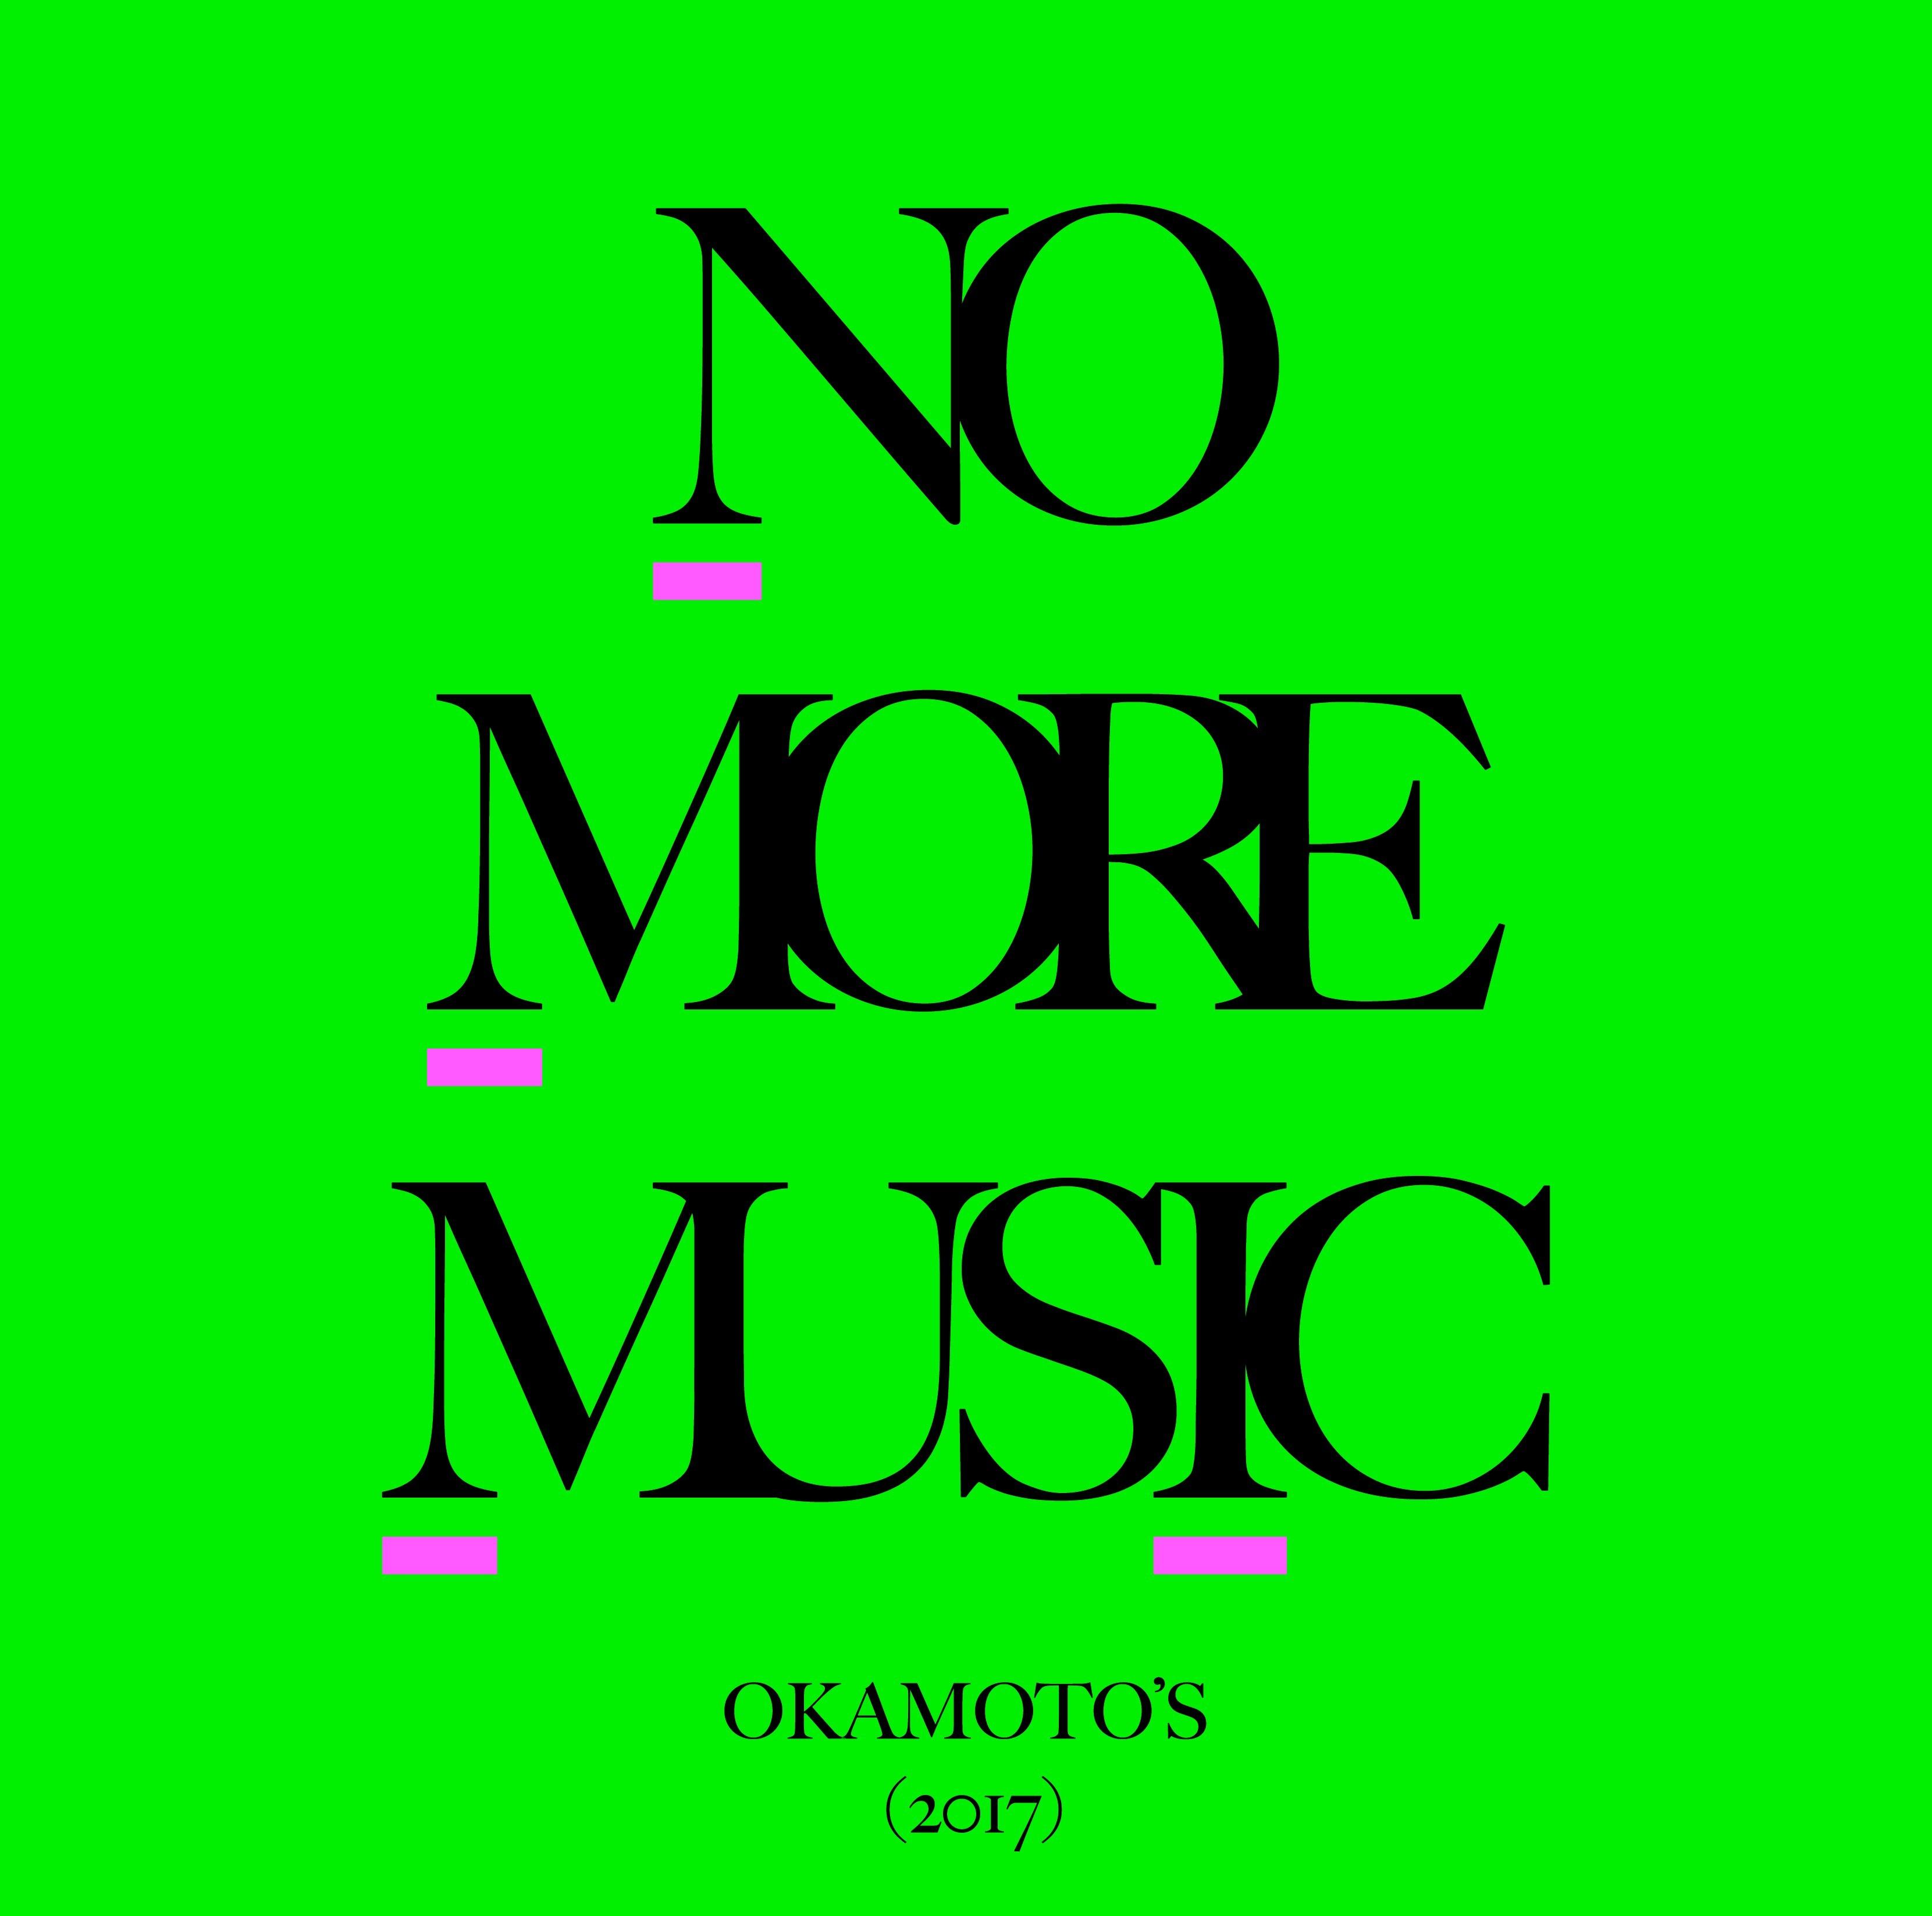 OKAMOTO'S『NO MORE MUSIC』